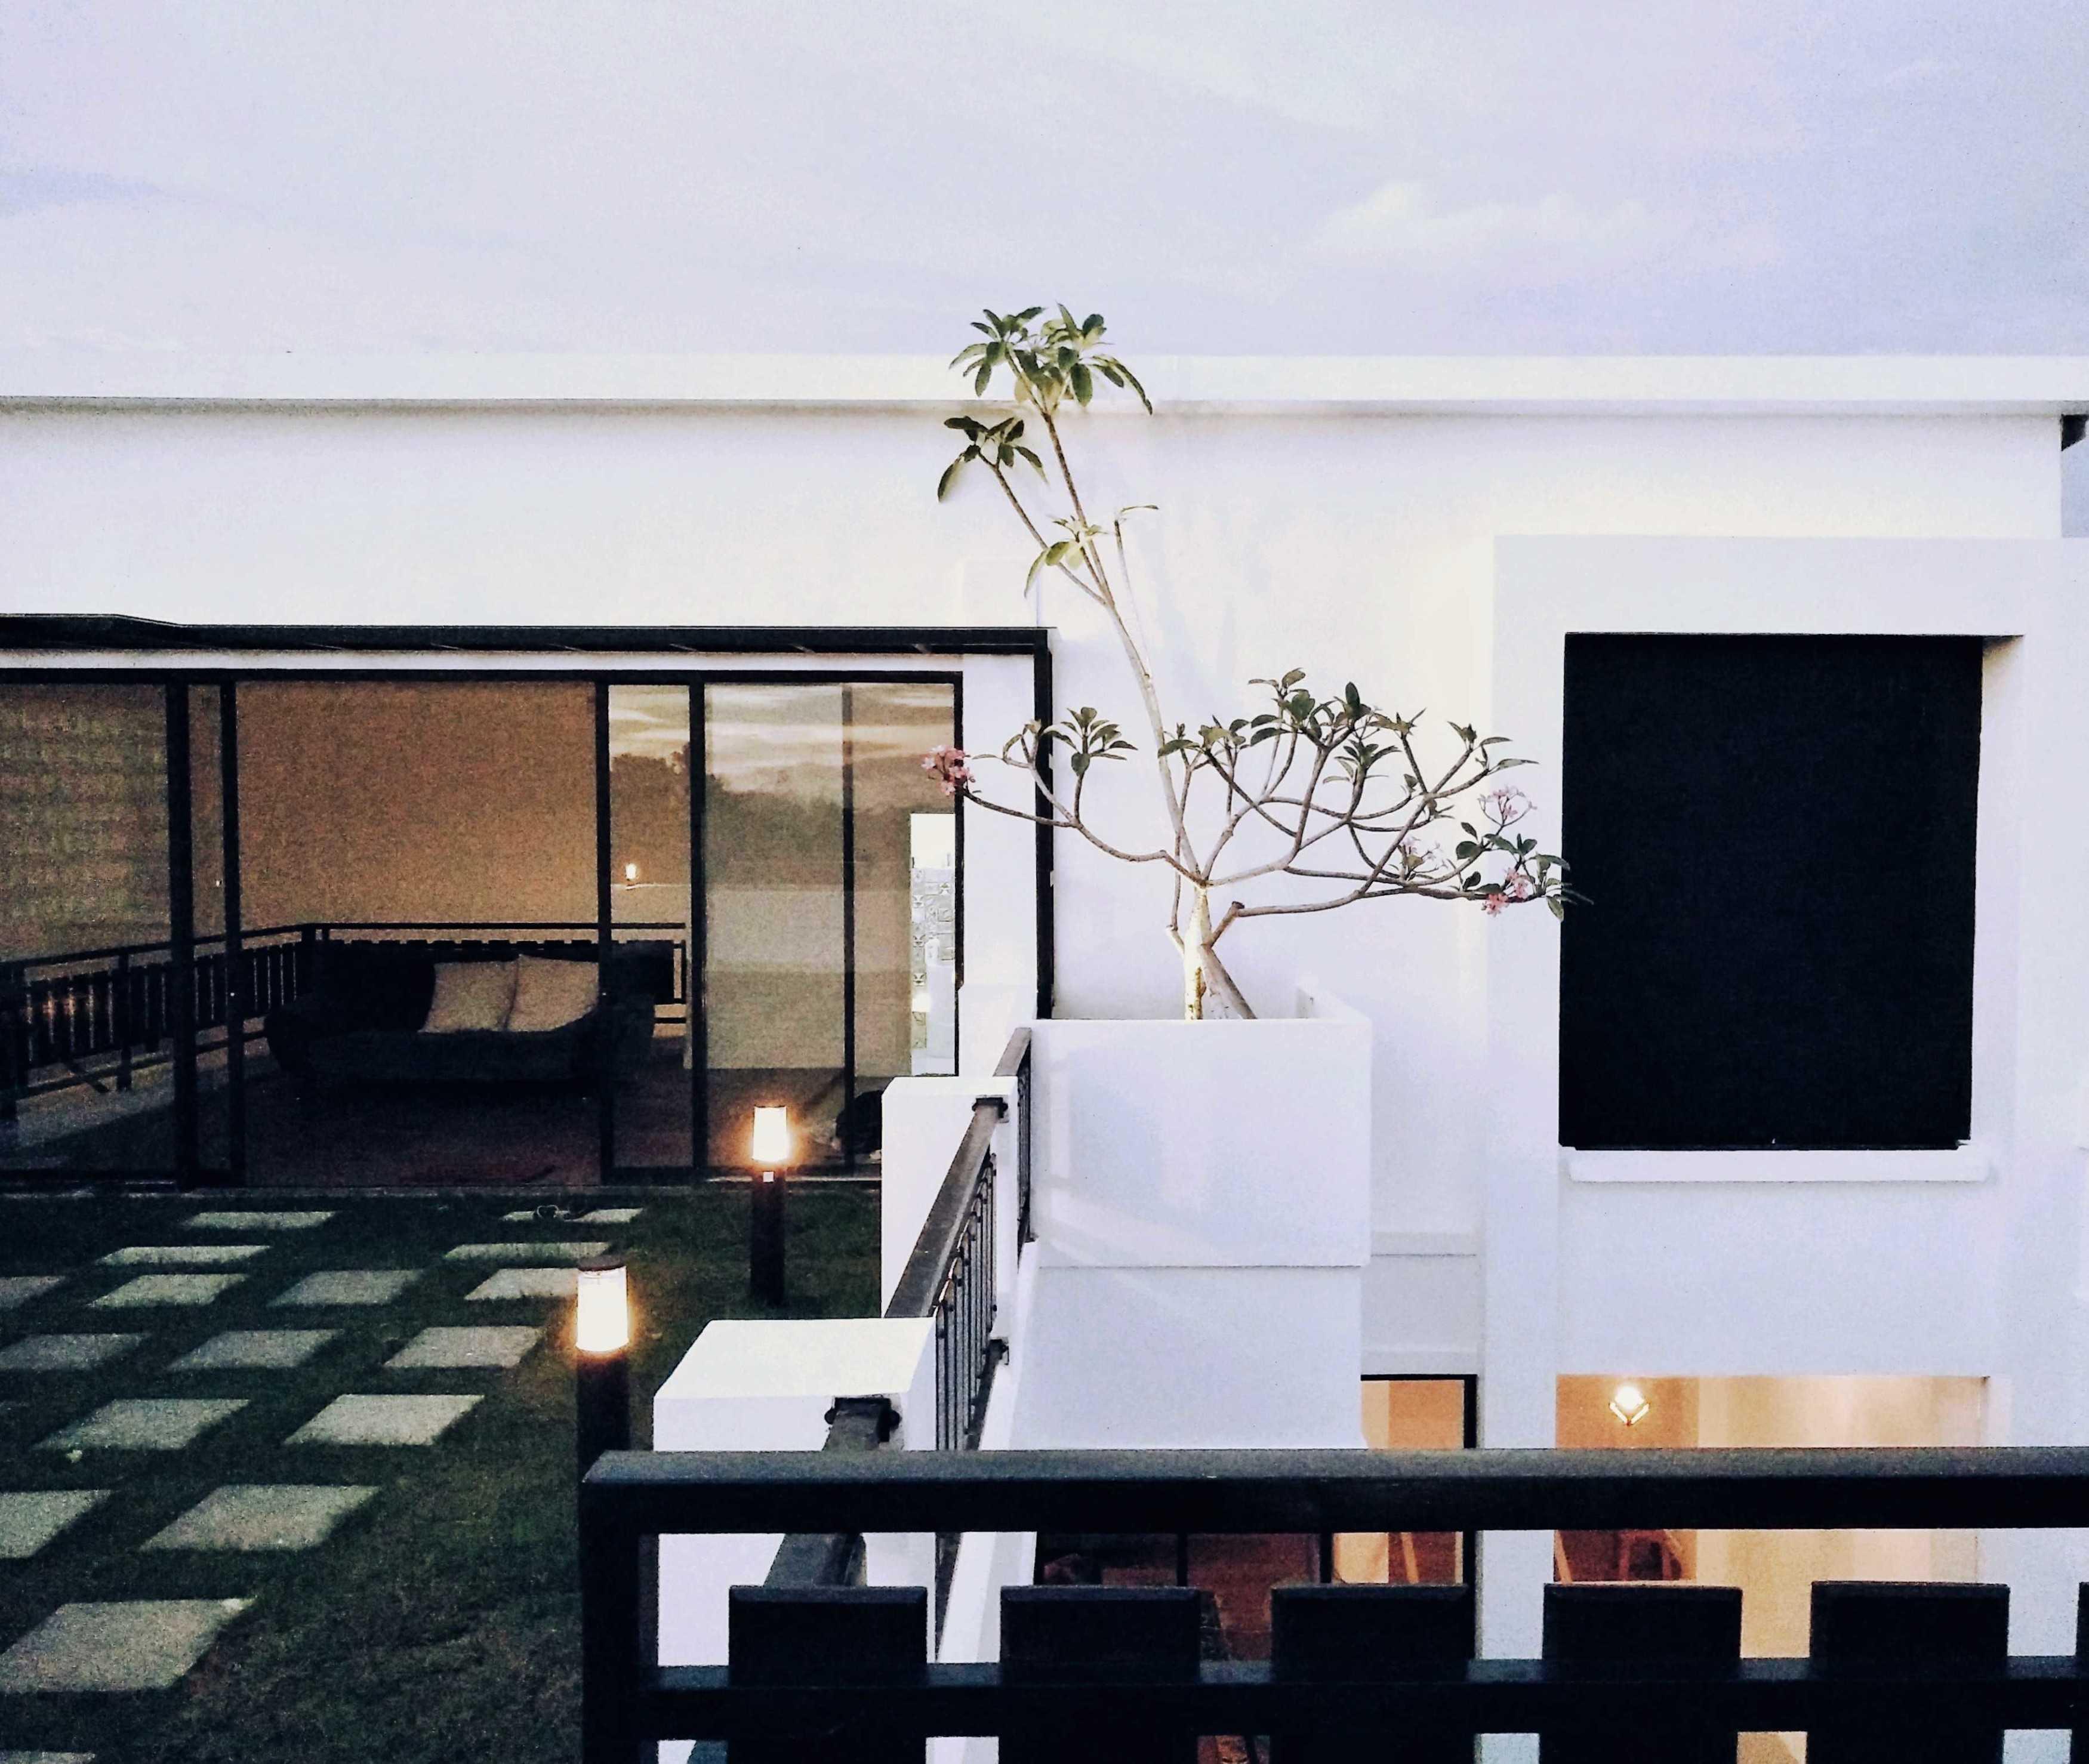 Padupadani Architect Martalena Green House Pontianak, Kota Pontianak, Kalimantan Barat, Indonesia Pontianak, Kota Pontianak, Kalimantan Barat, Indonesia Img20170524122305640   37655